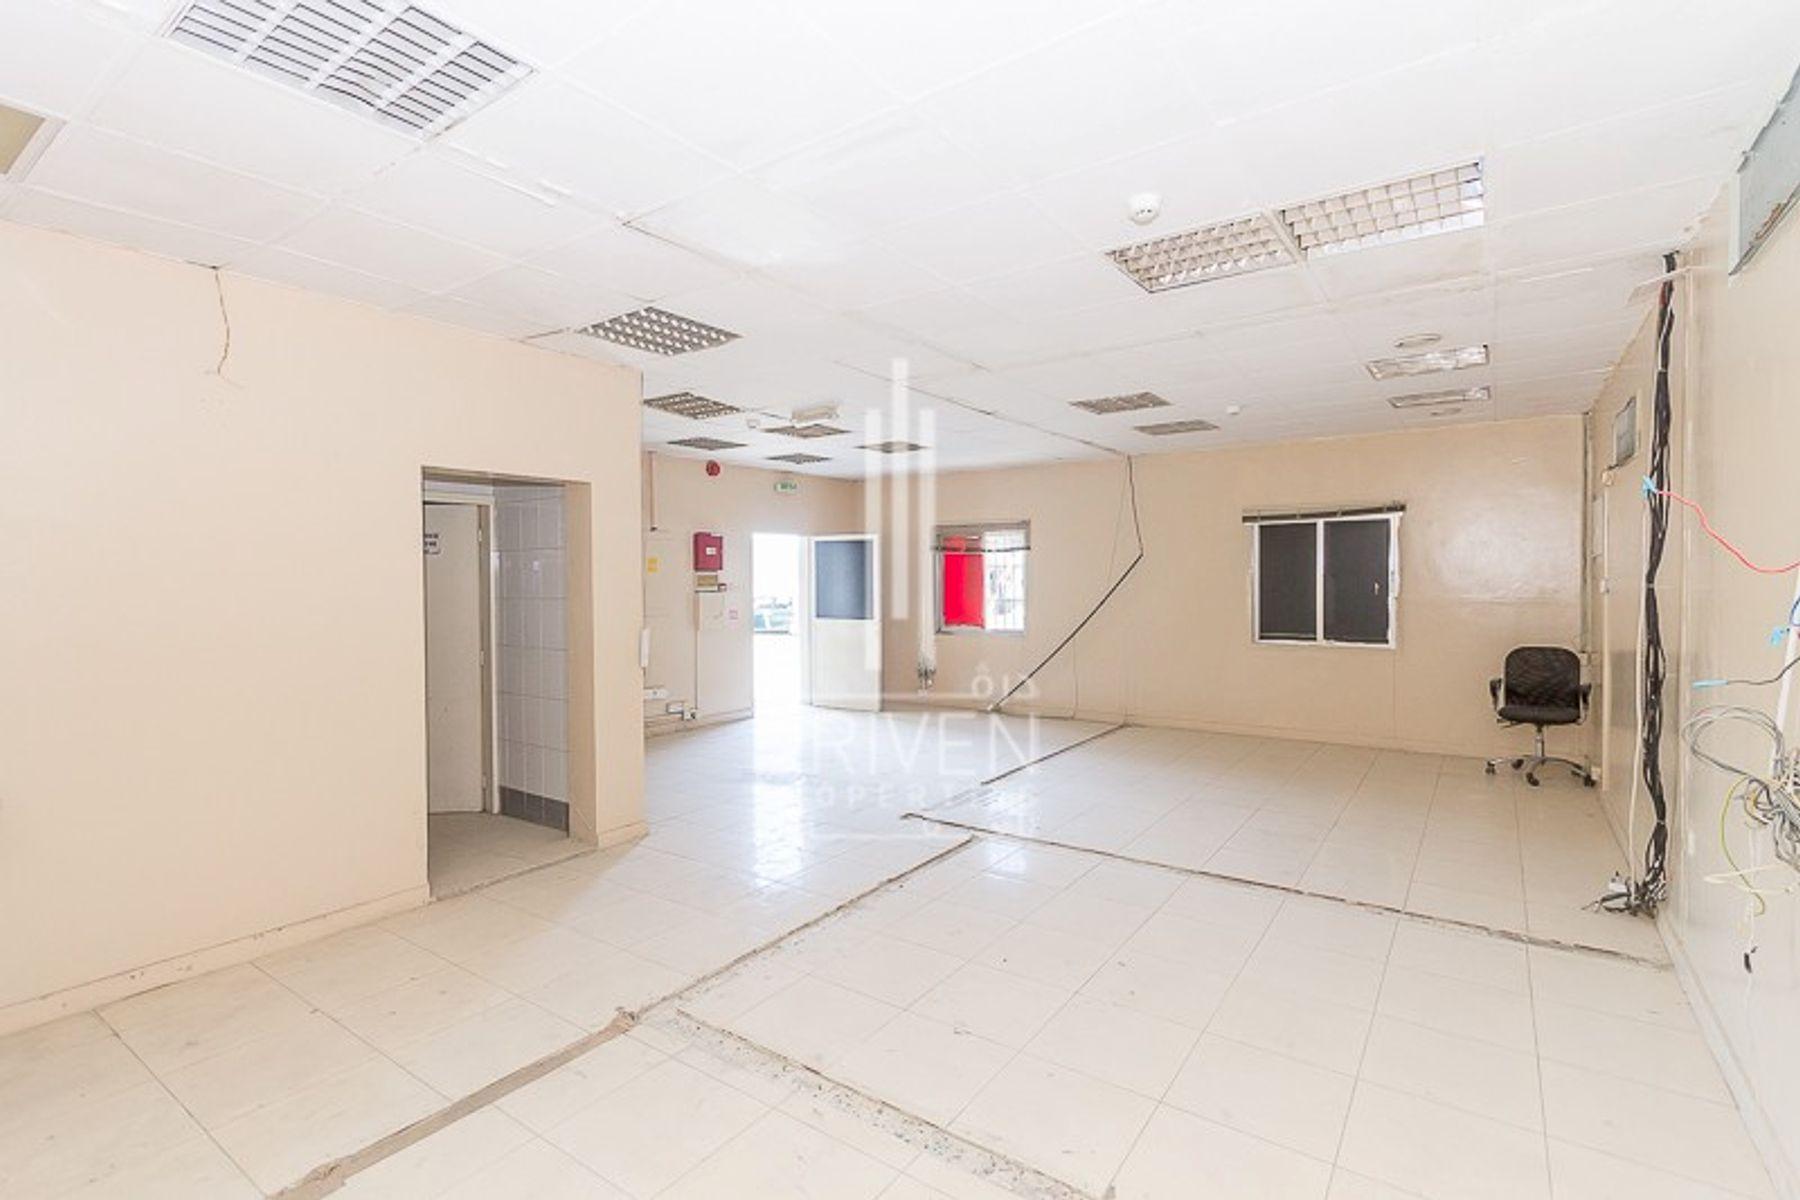 Warehouse for Rent in Ras Al Khor Industrial 1, Ras Al Khor